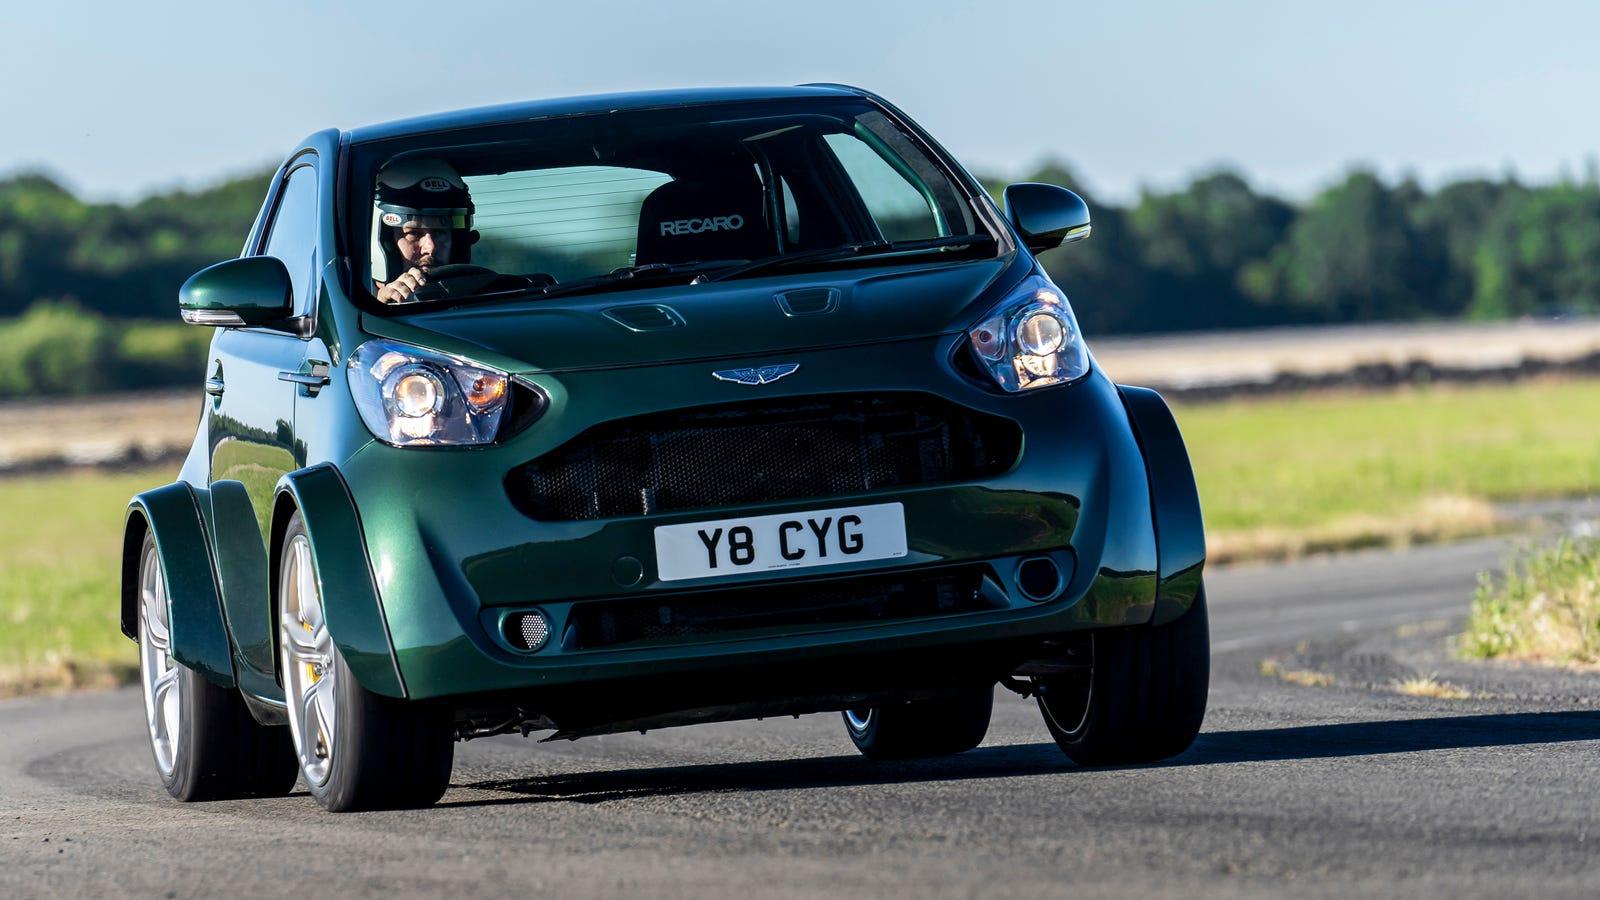 The Aston Martin V8 Cygnet Is Your Dream 430 HP City Car